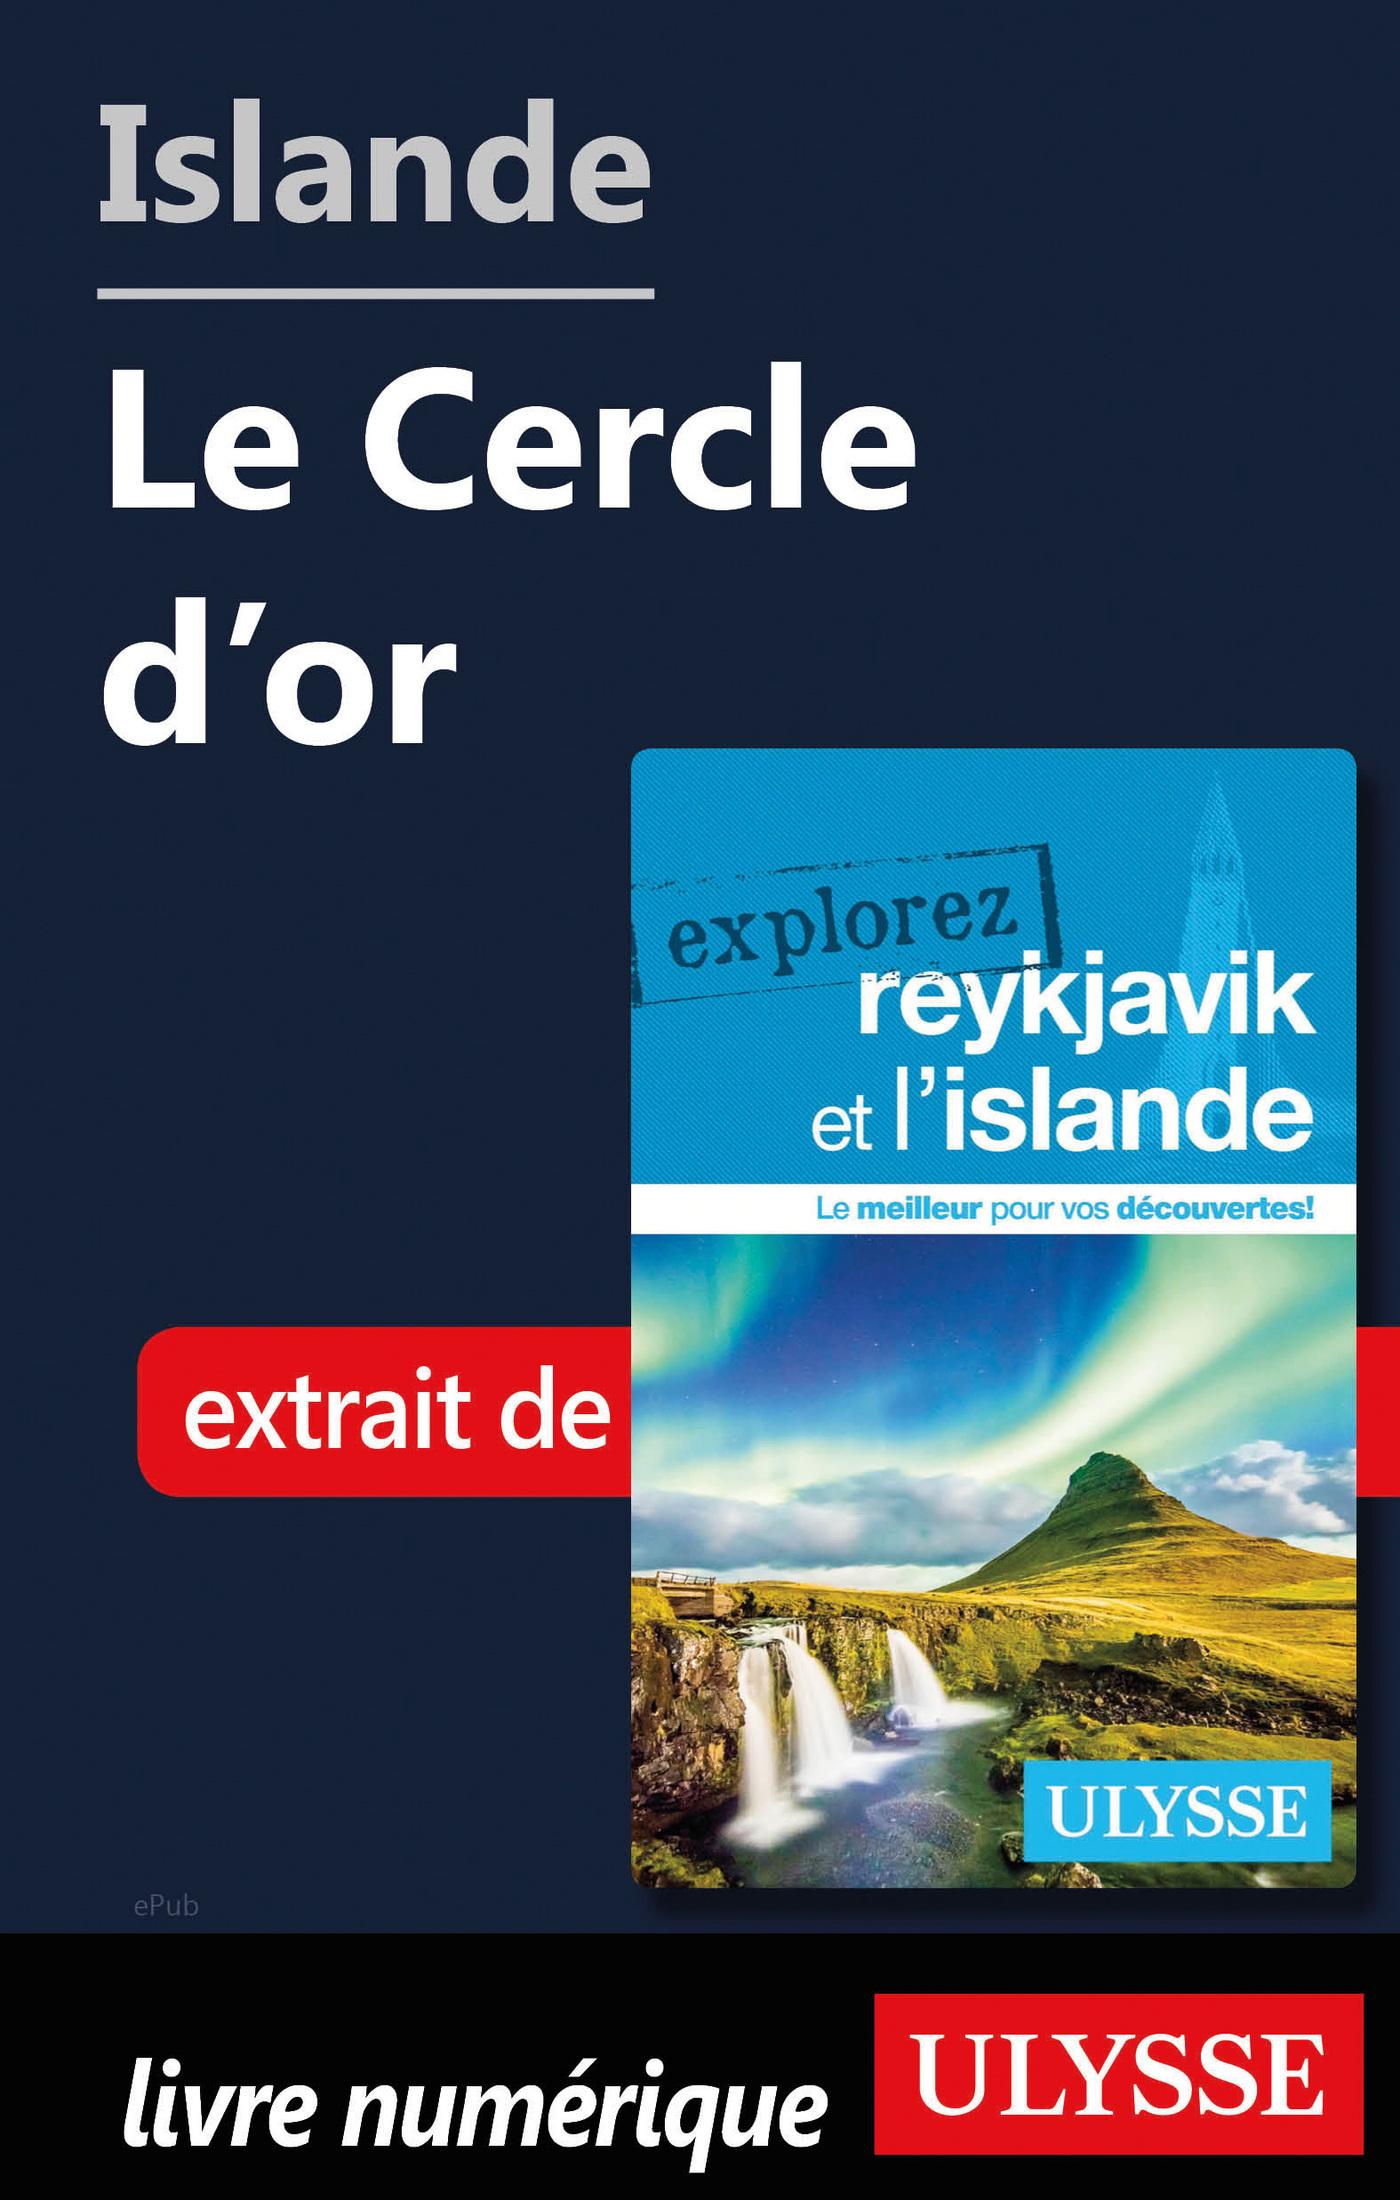 Islande - Le cercle d'or